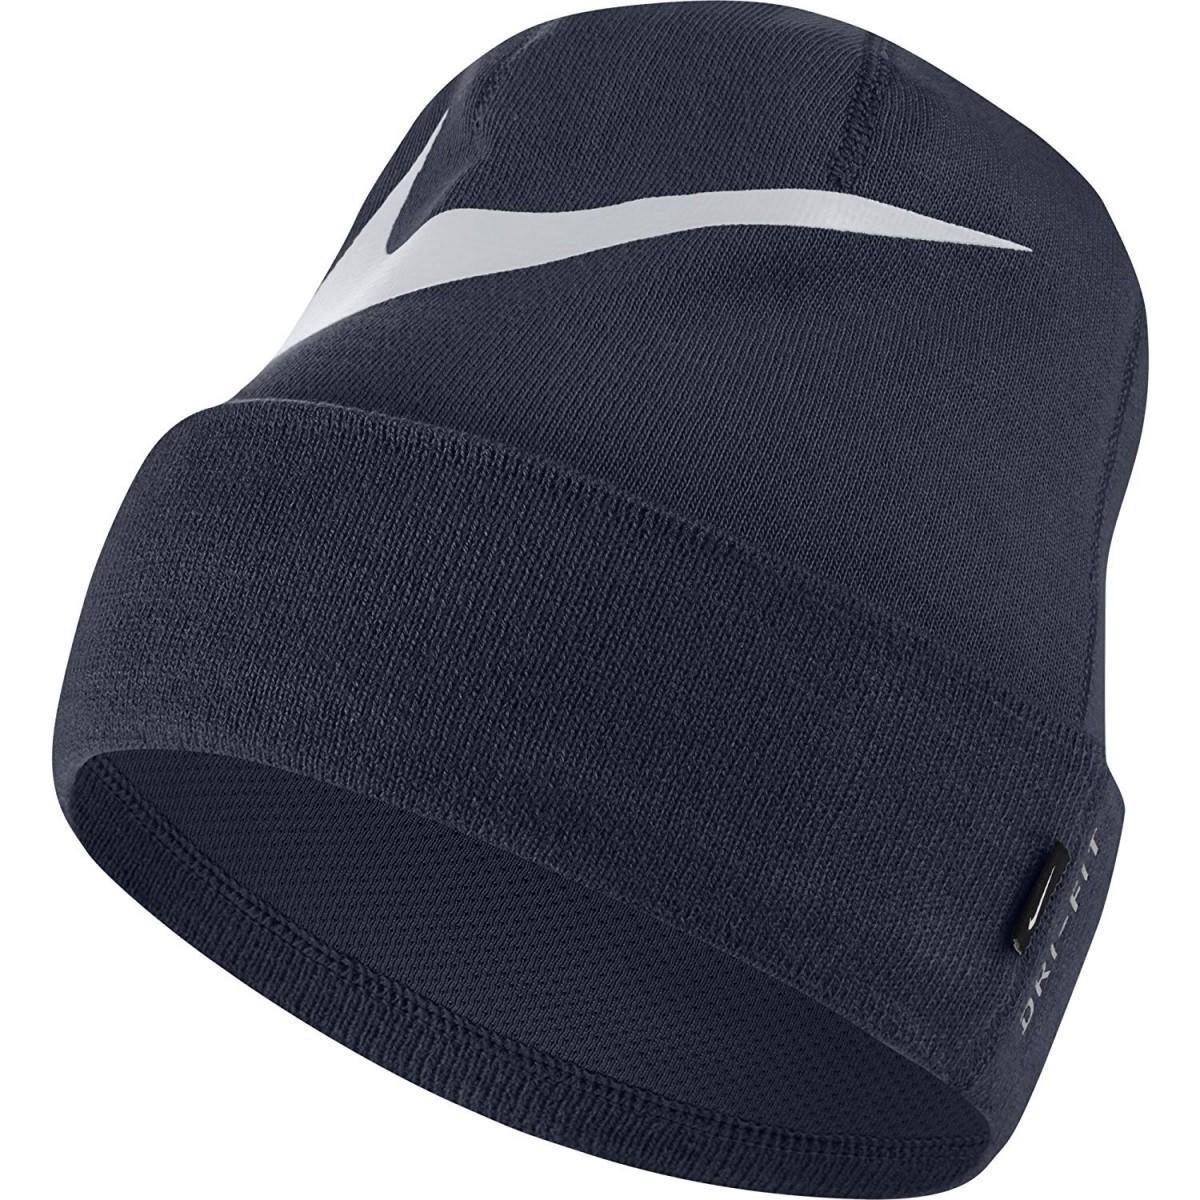 Спортивная шапка Nike Swoosh Cuffed Beanie obsidian/pure platinum